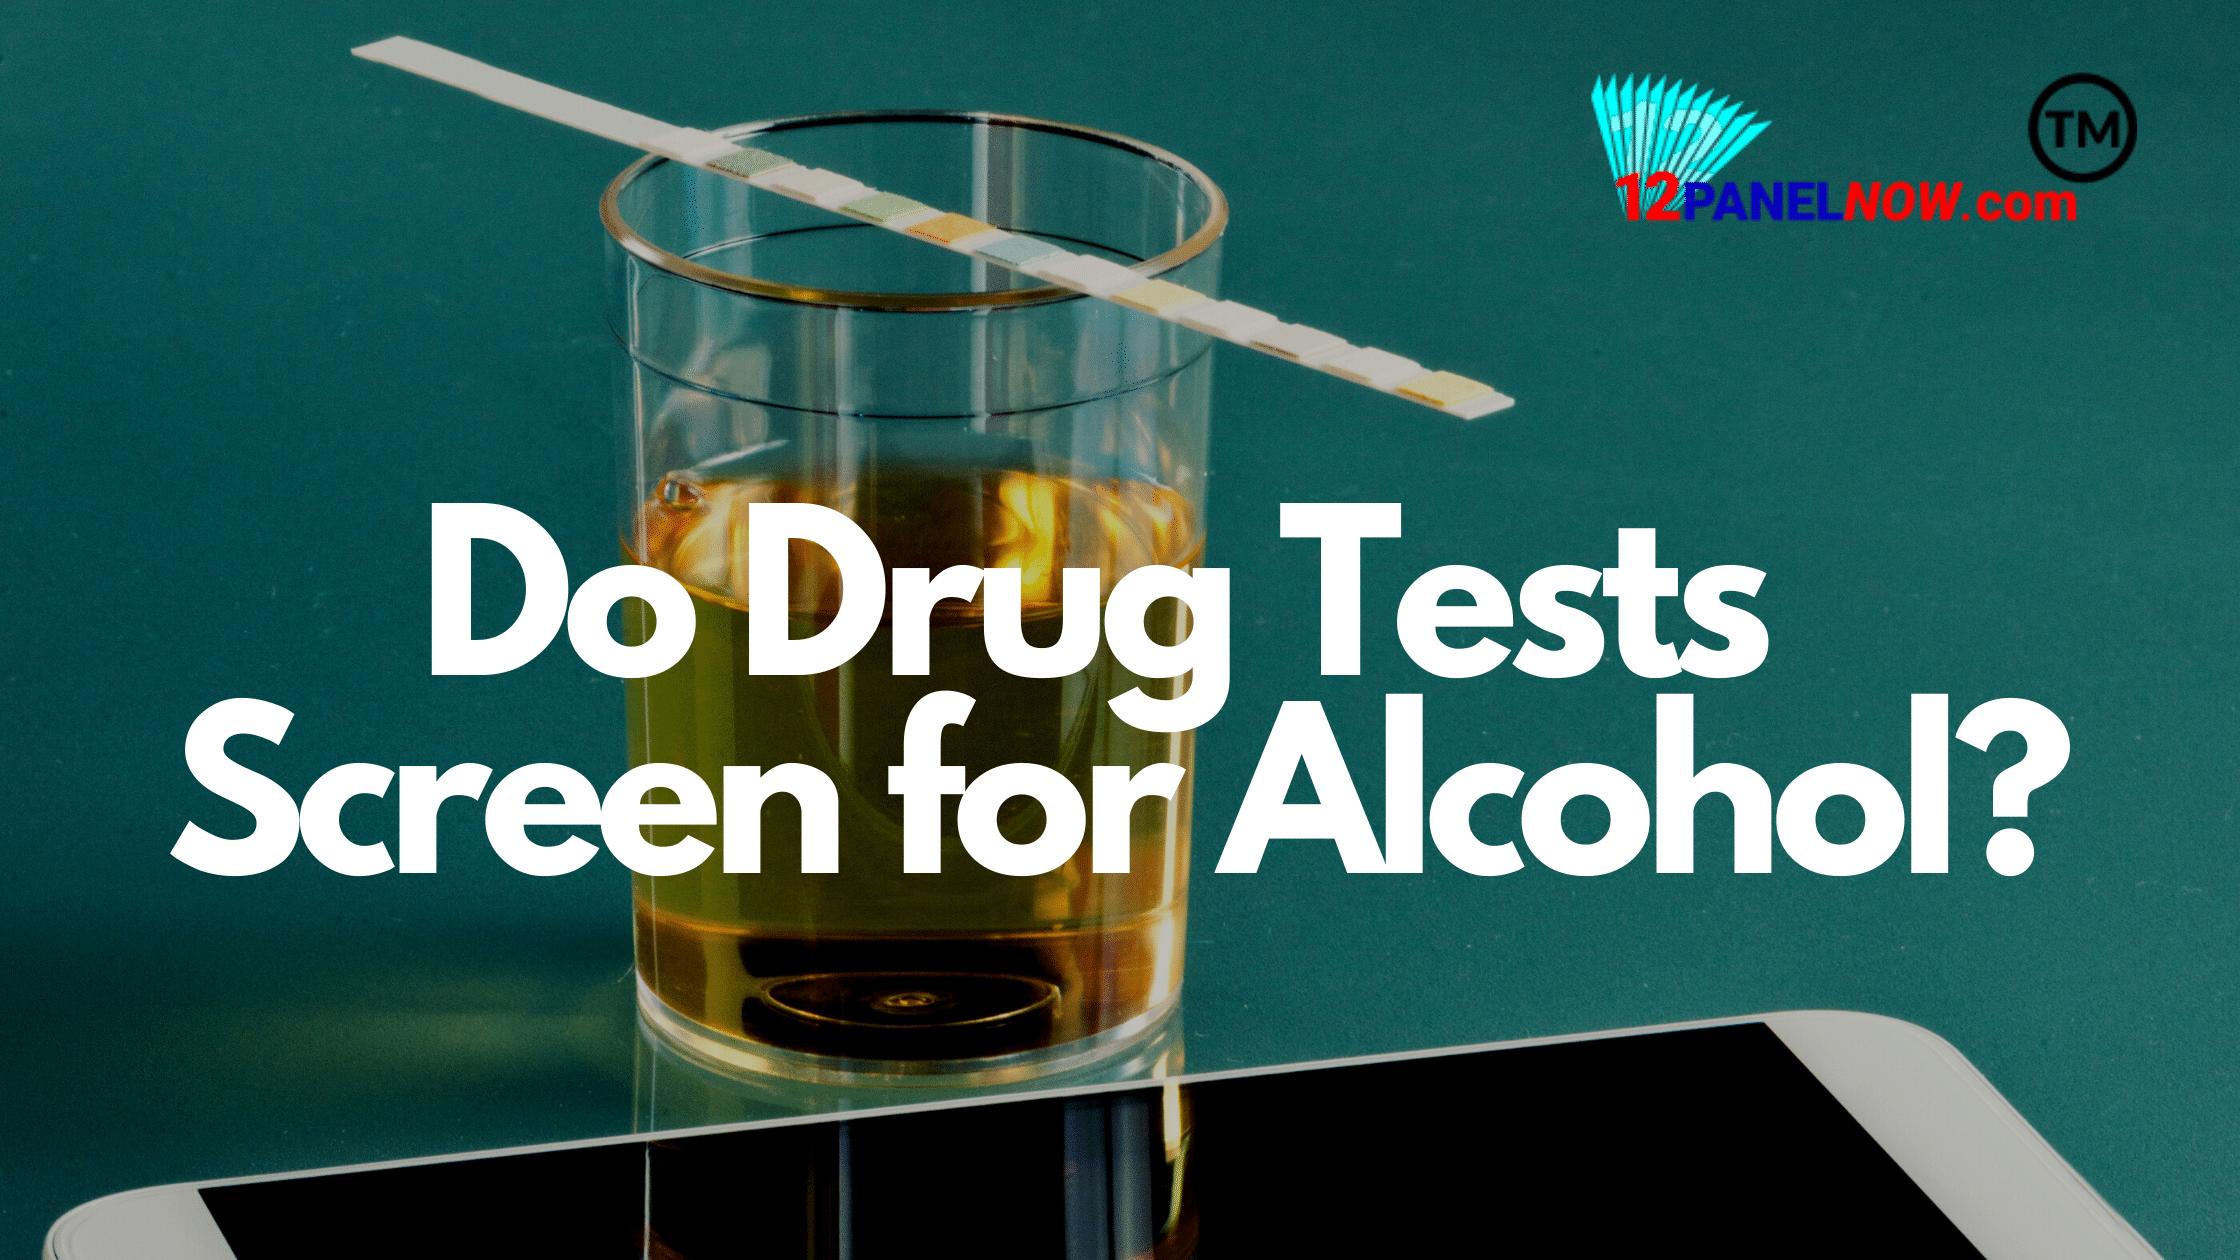 Alcohol Detection on 12 Panel Drug Tests